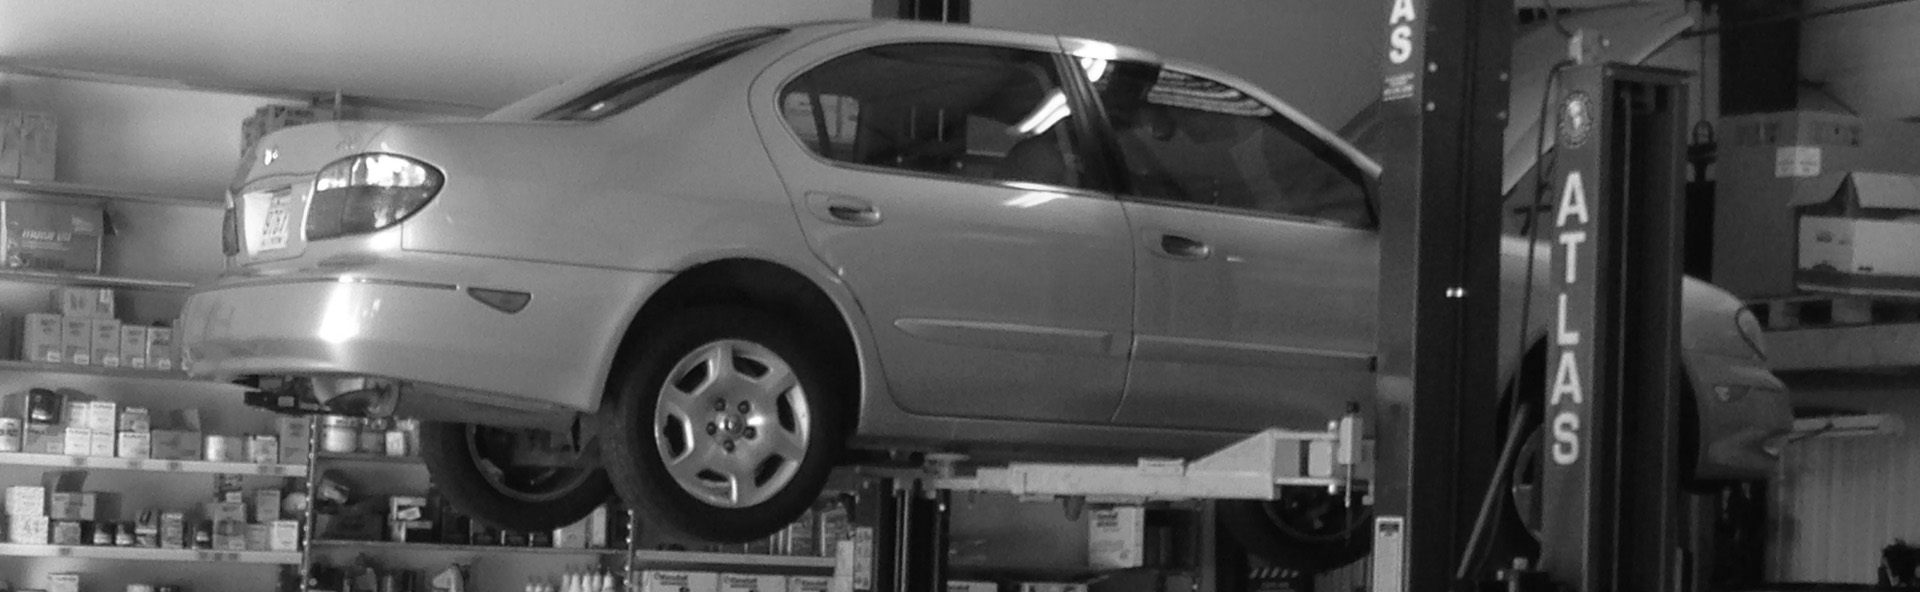 auto repair shop marietta ga car mechanic services. Black Bedroom Furniture Sets. Home Design Ideas